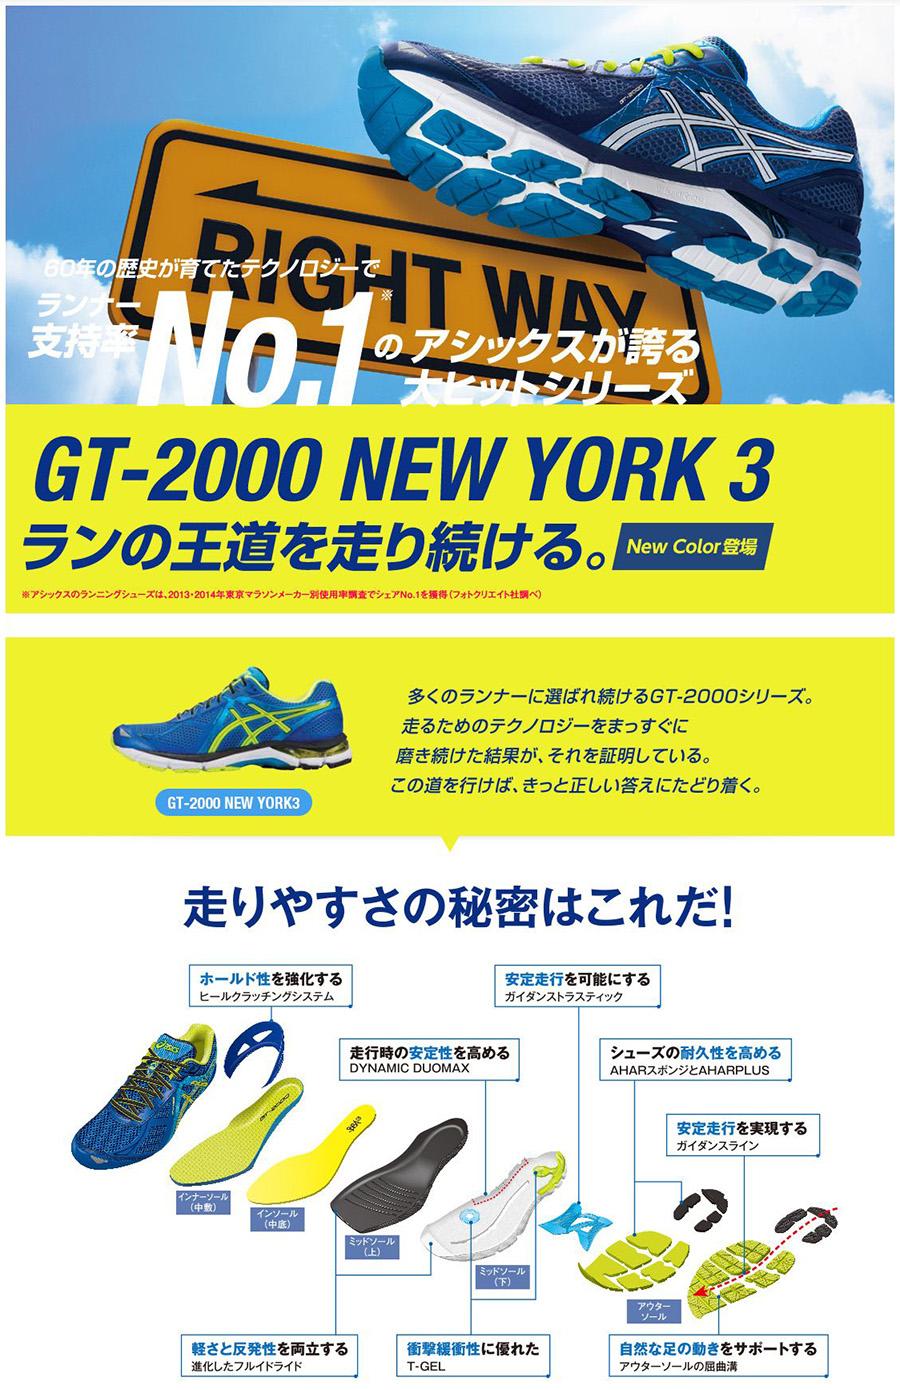 GT-2000 NEW YORK 3